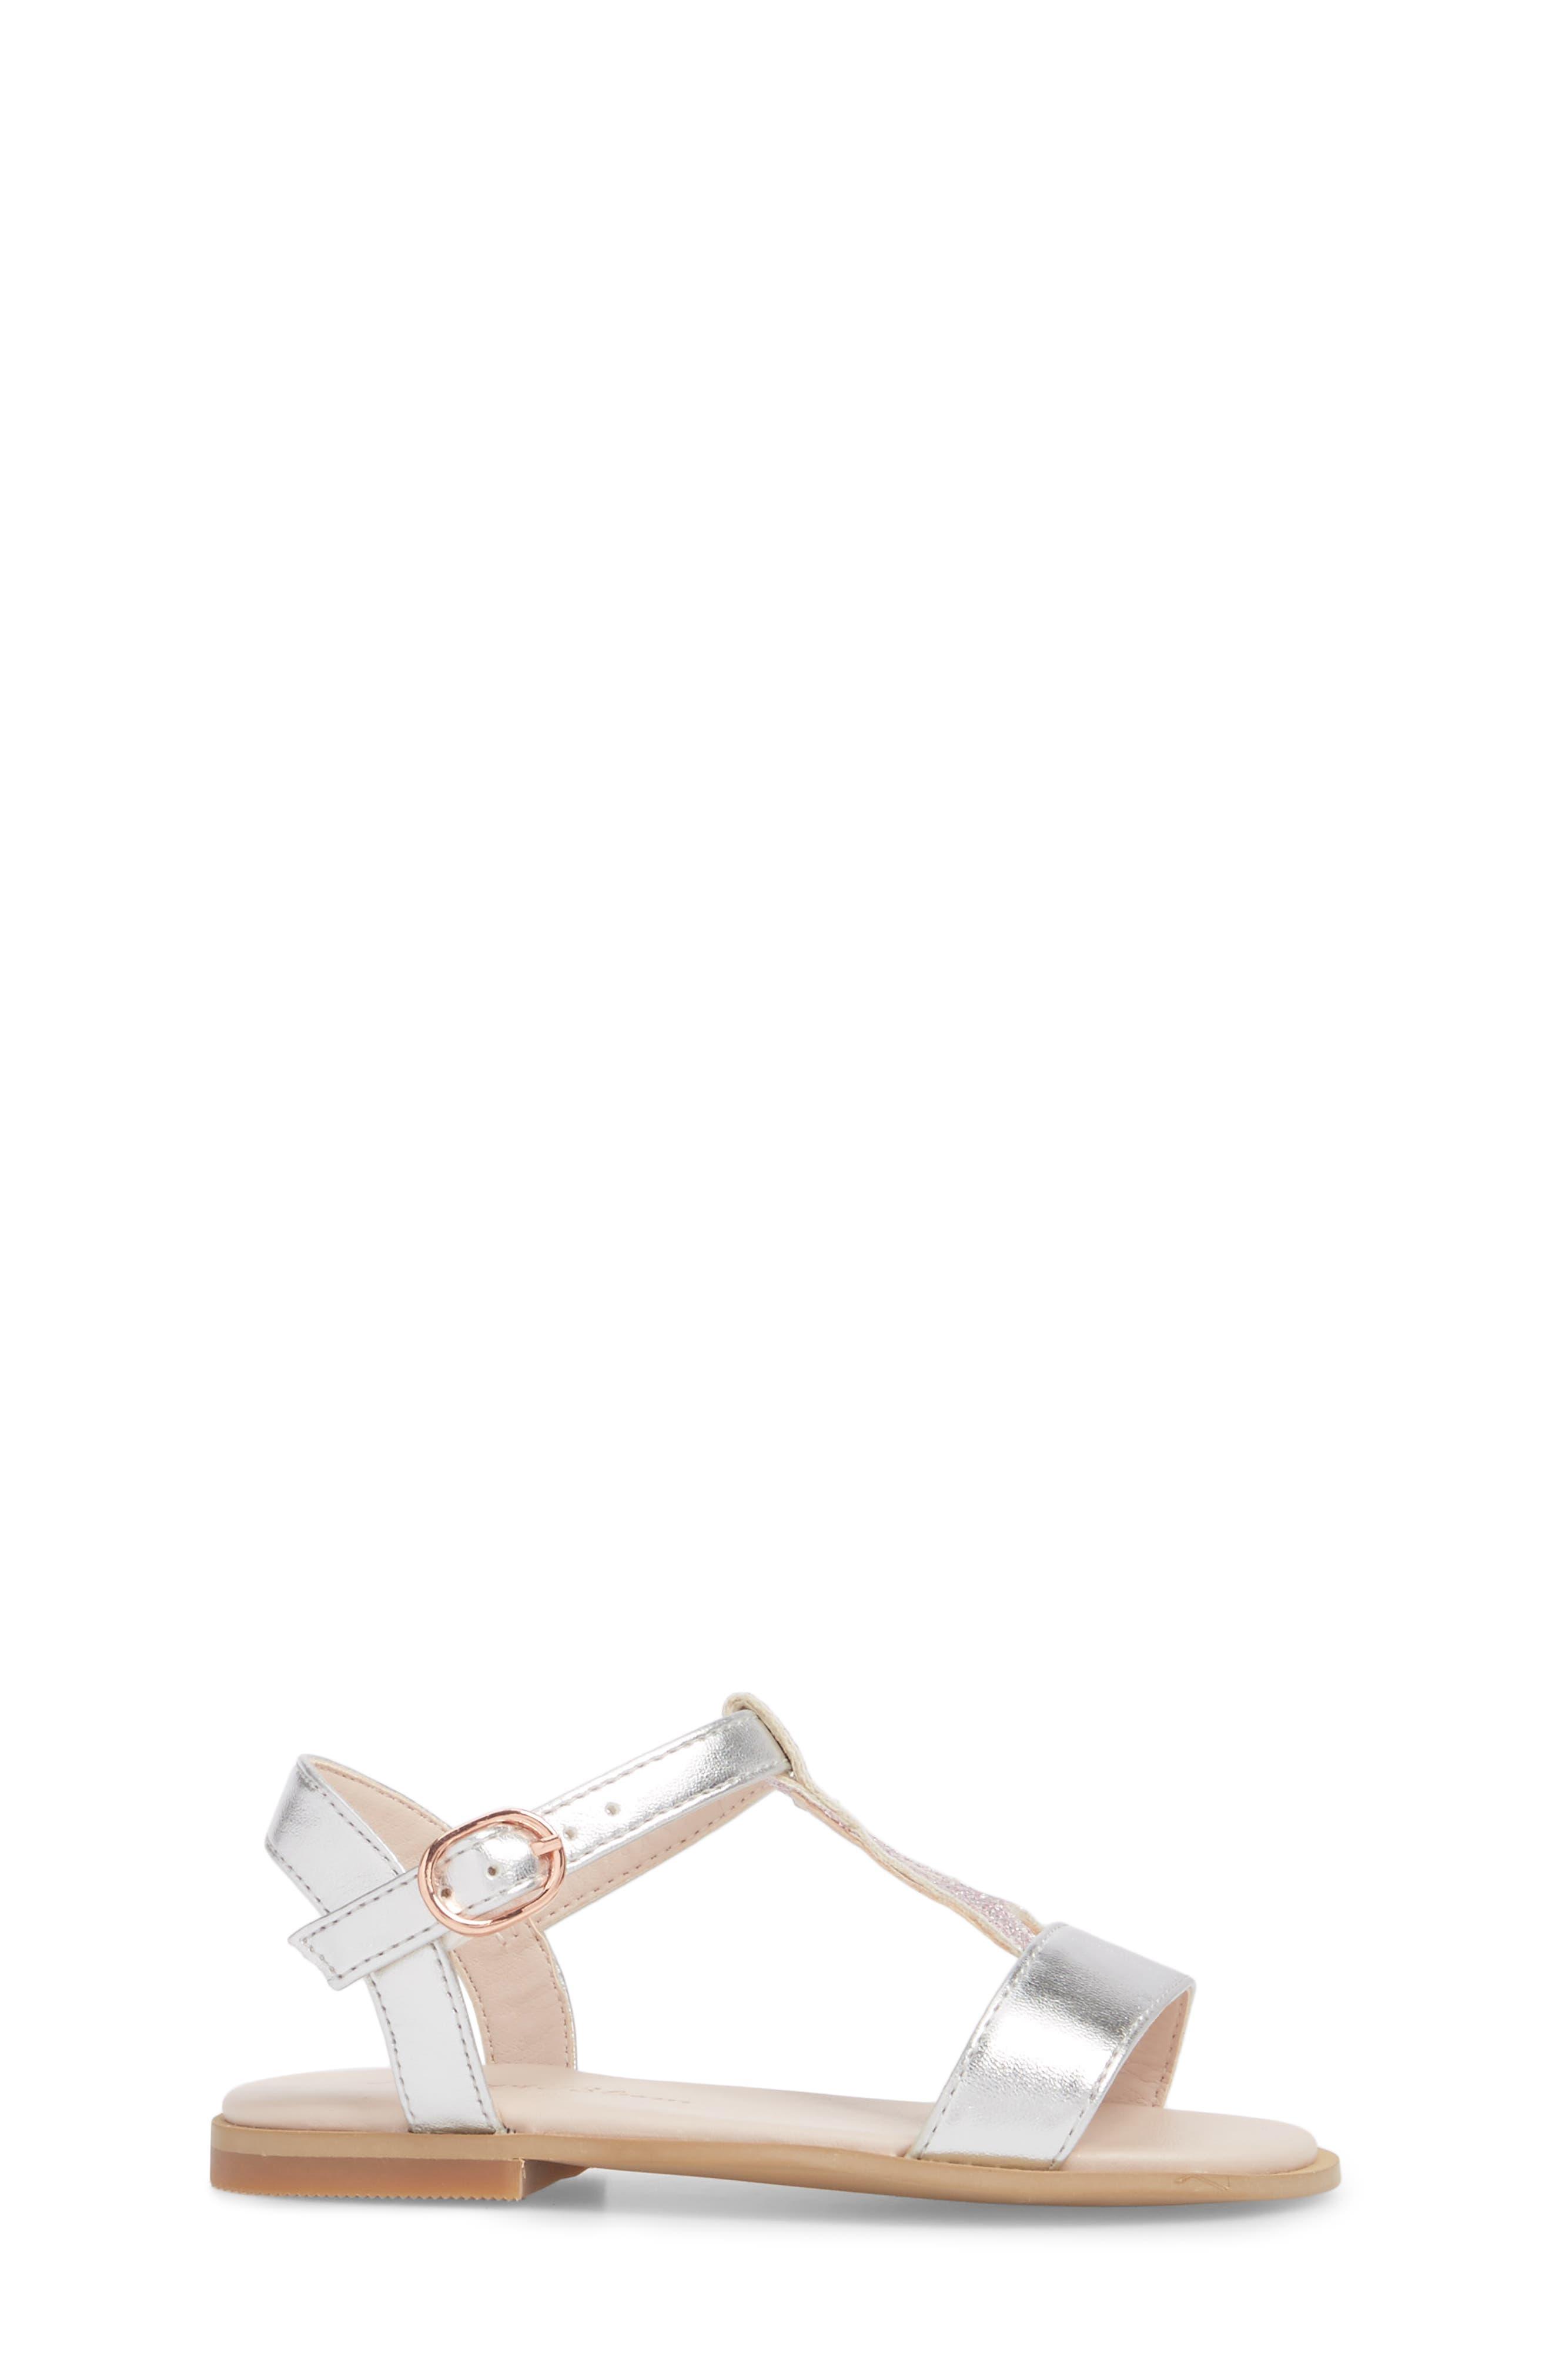 Tegan Glitter T-Strap Sandal,                             Alternate thumbnail 3, color,                             040